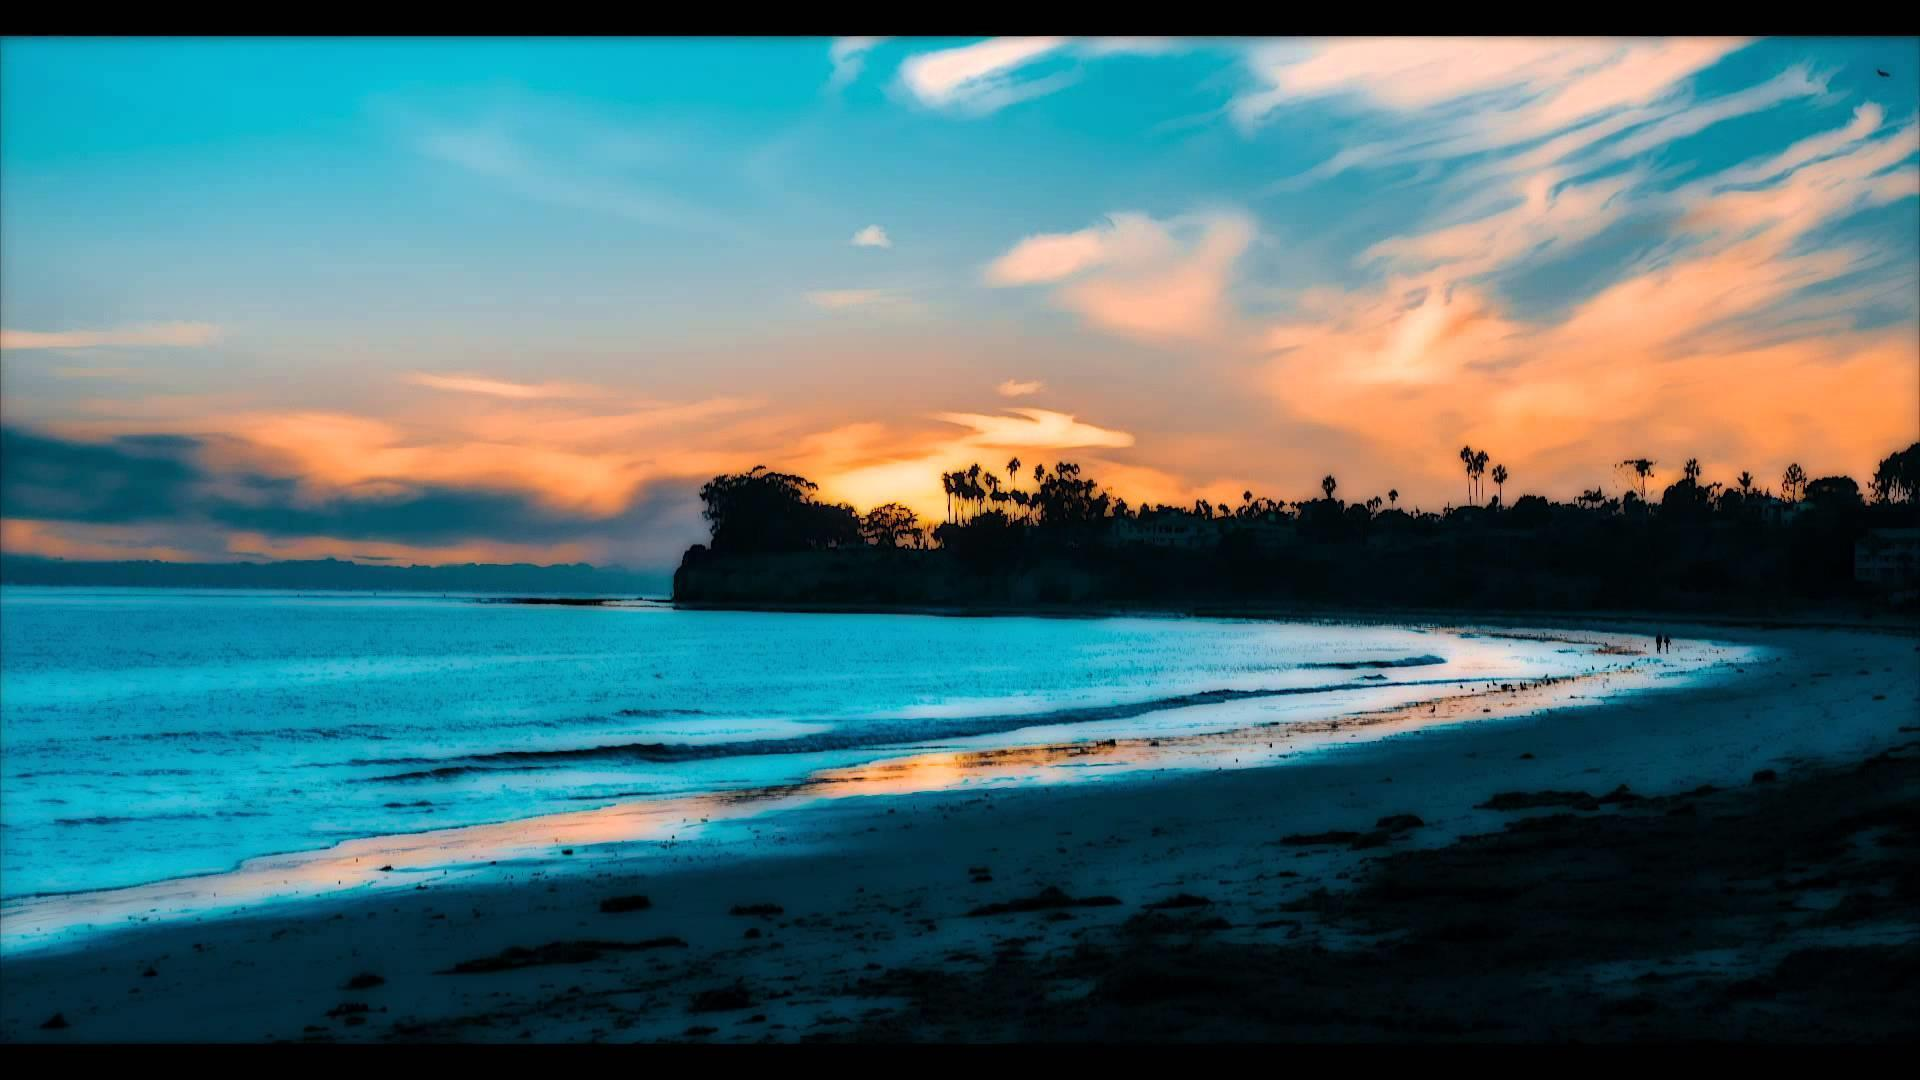 Live wallpapers screenshot 2 Santa Barbara. Live wallpapers screenshot 3 ...